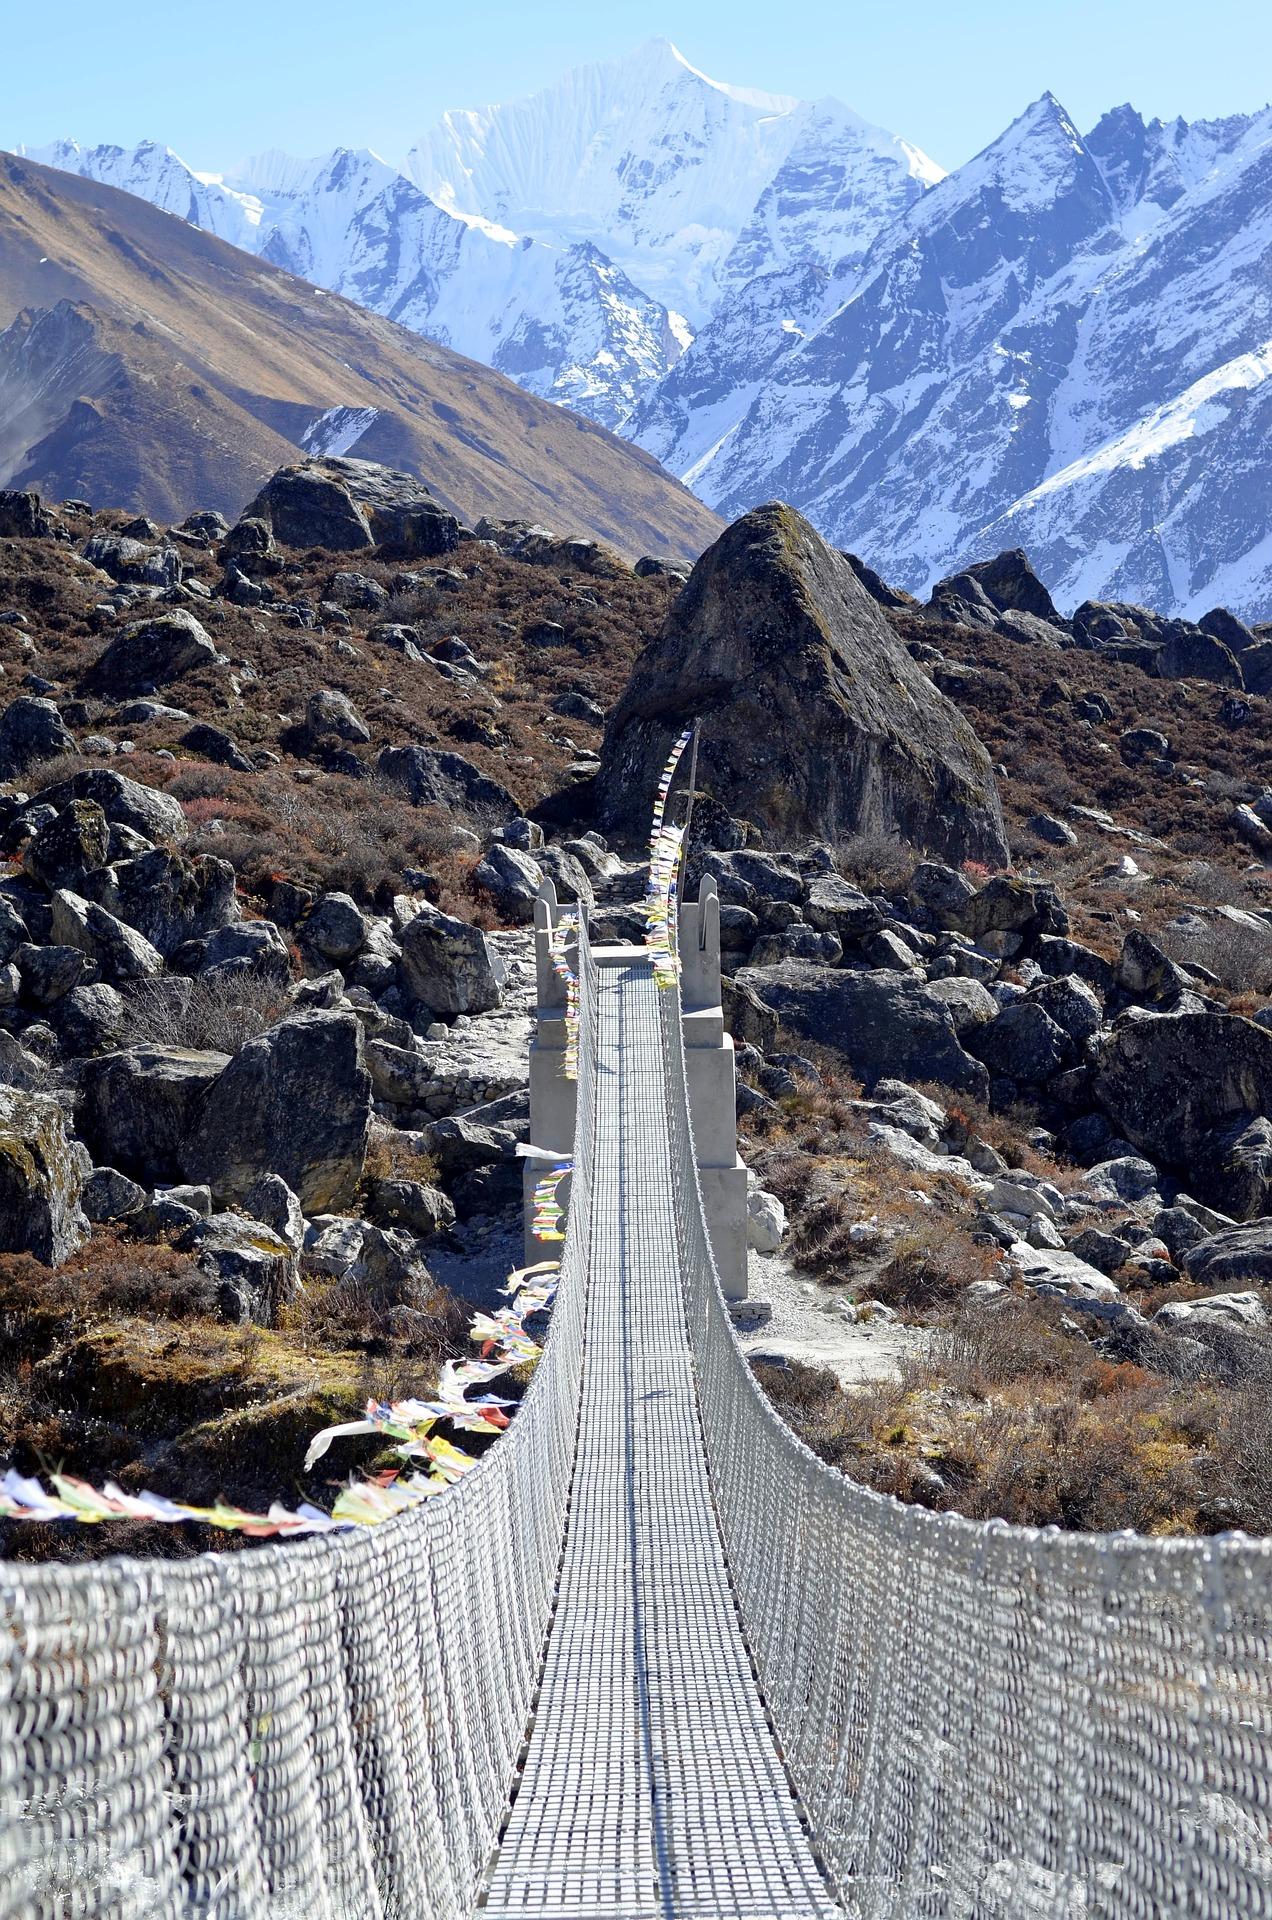 Trekkings in Nepal